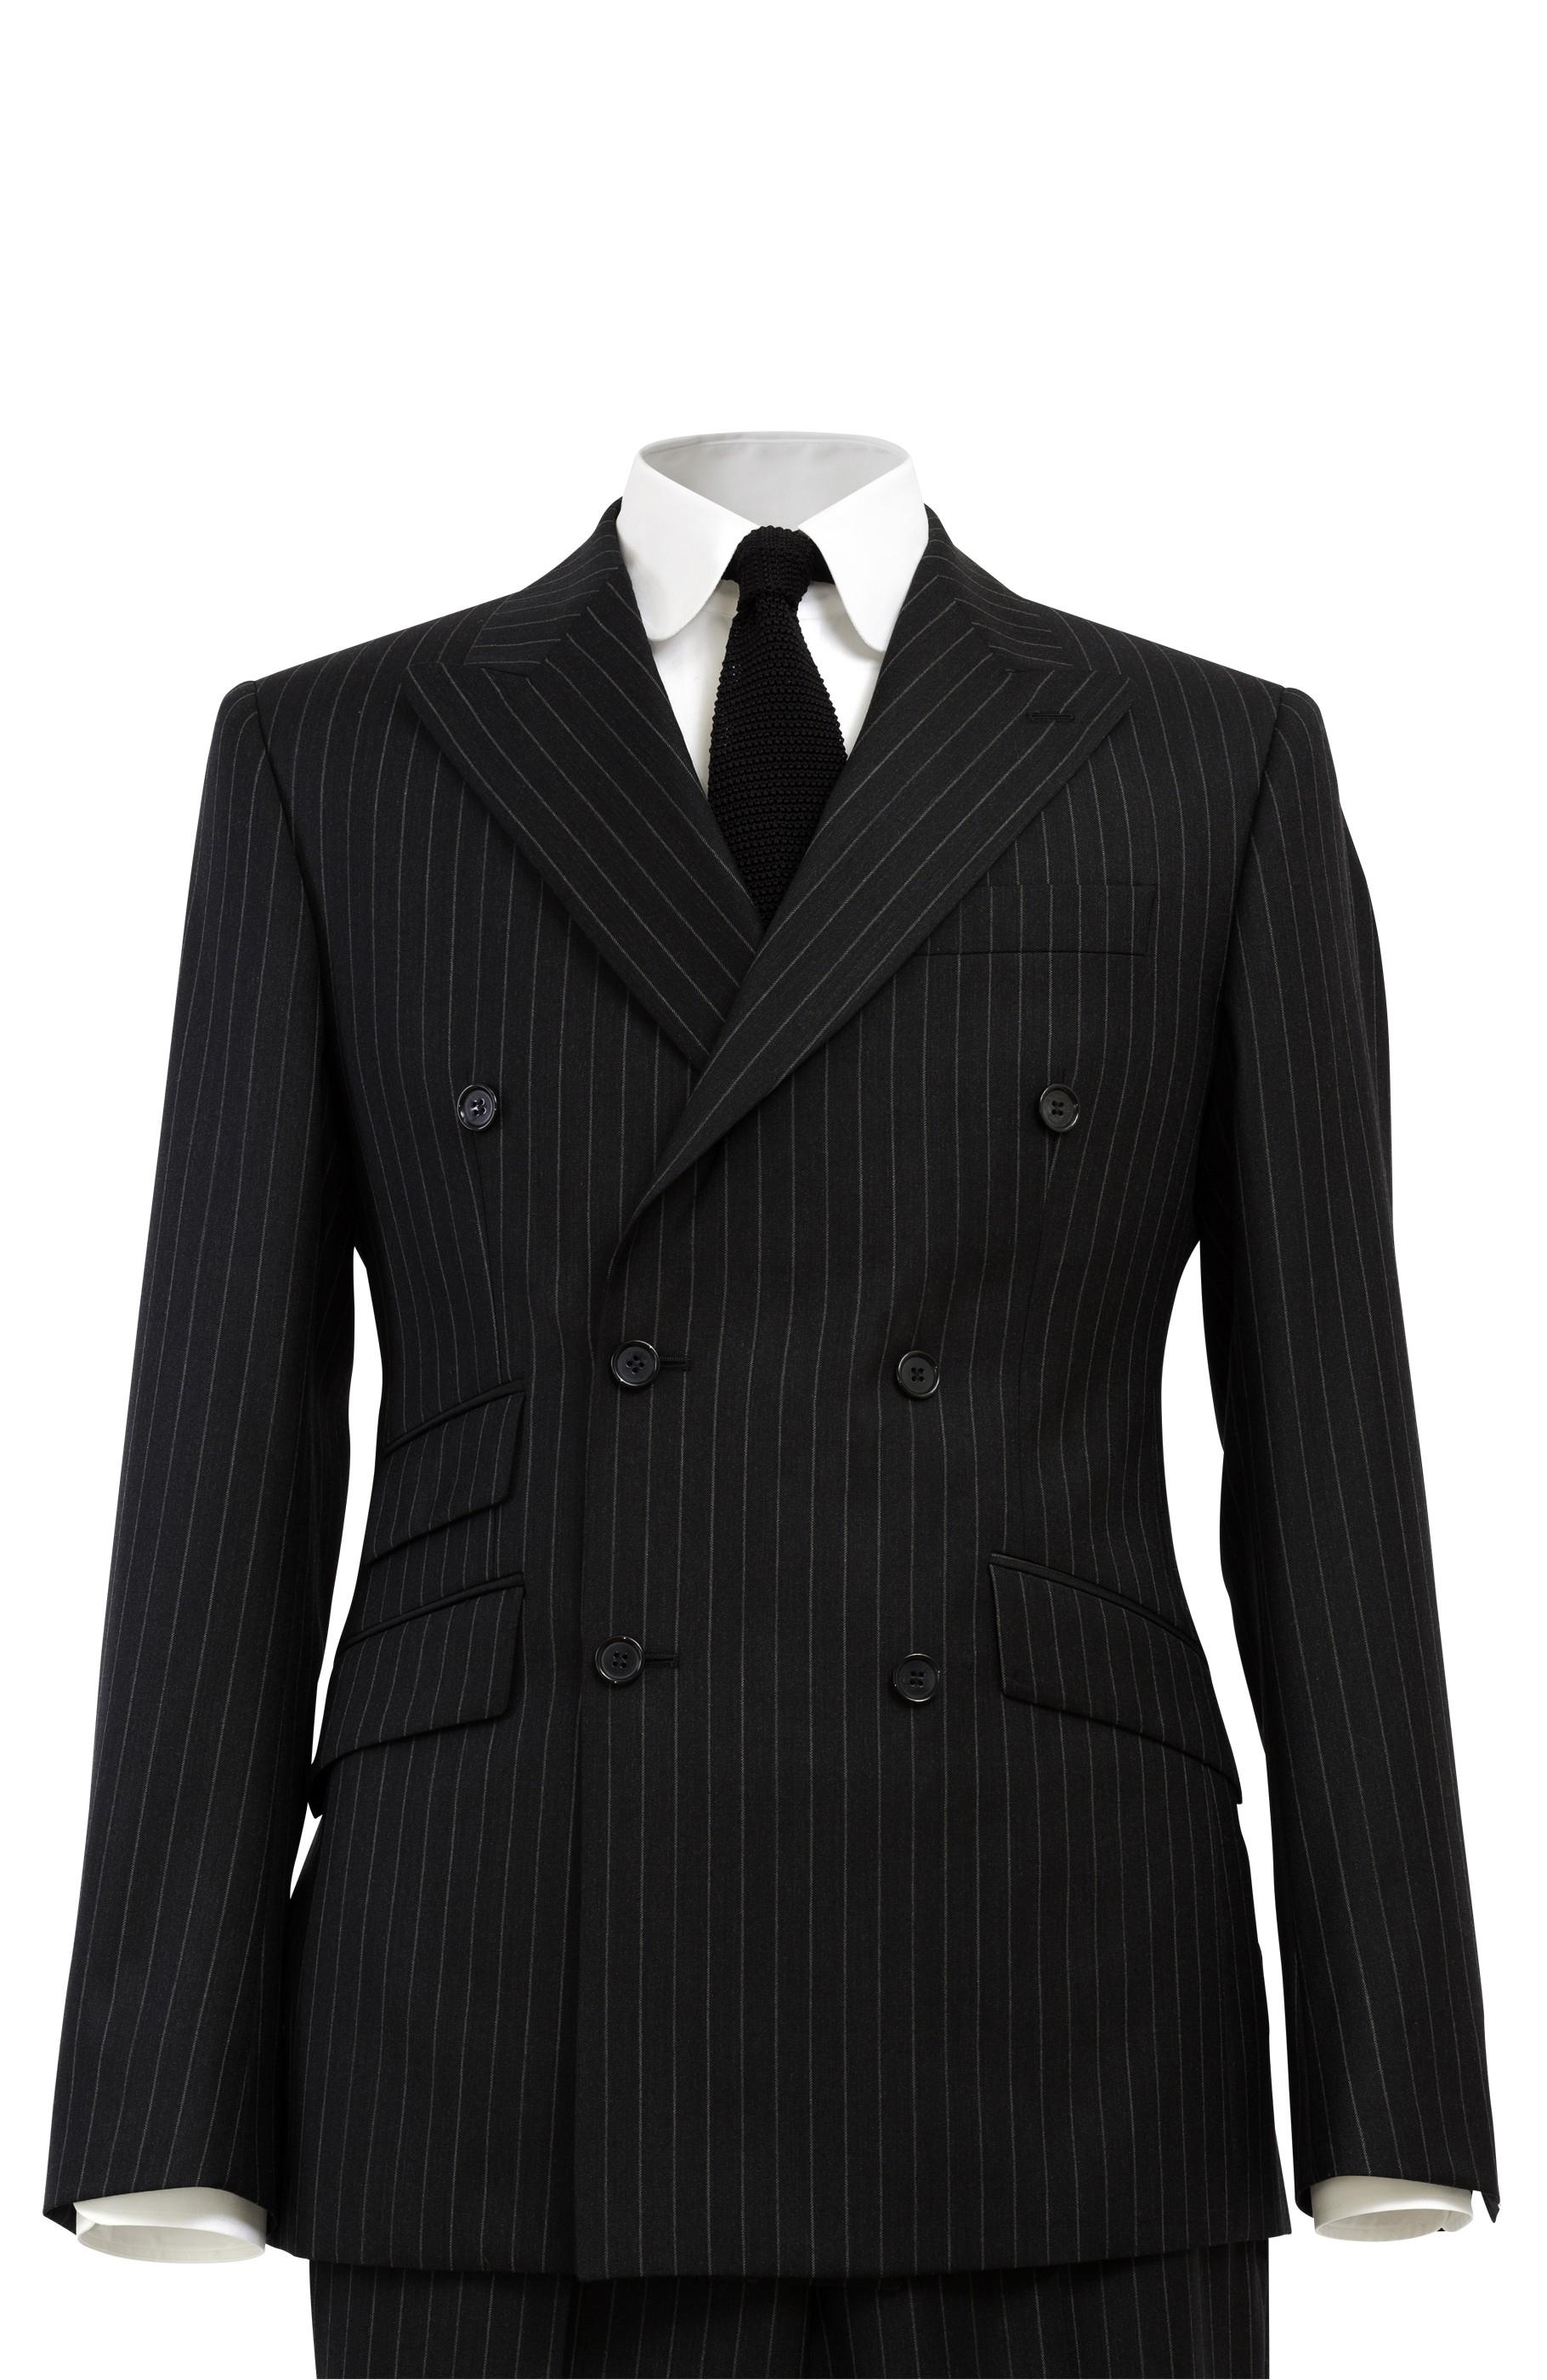 Majesté Couture Paris: SAINT GERMAIN GREY DOUBLE-BREASTED WOVEN SUIT | Clothing,Clothing > Suits -  Hiphunters Shop